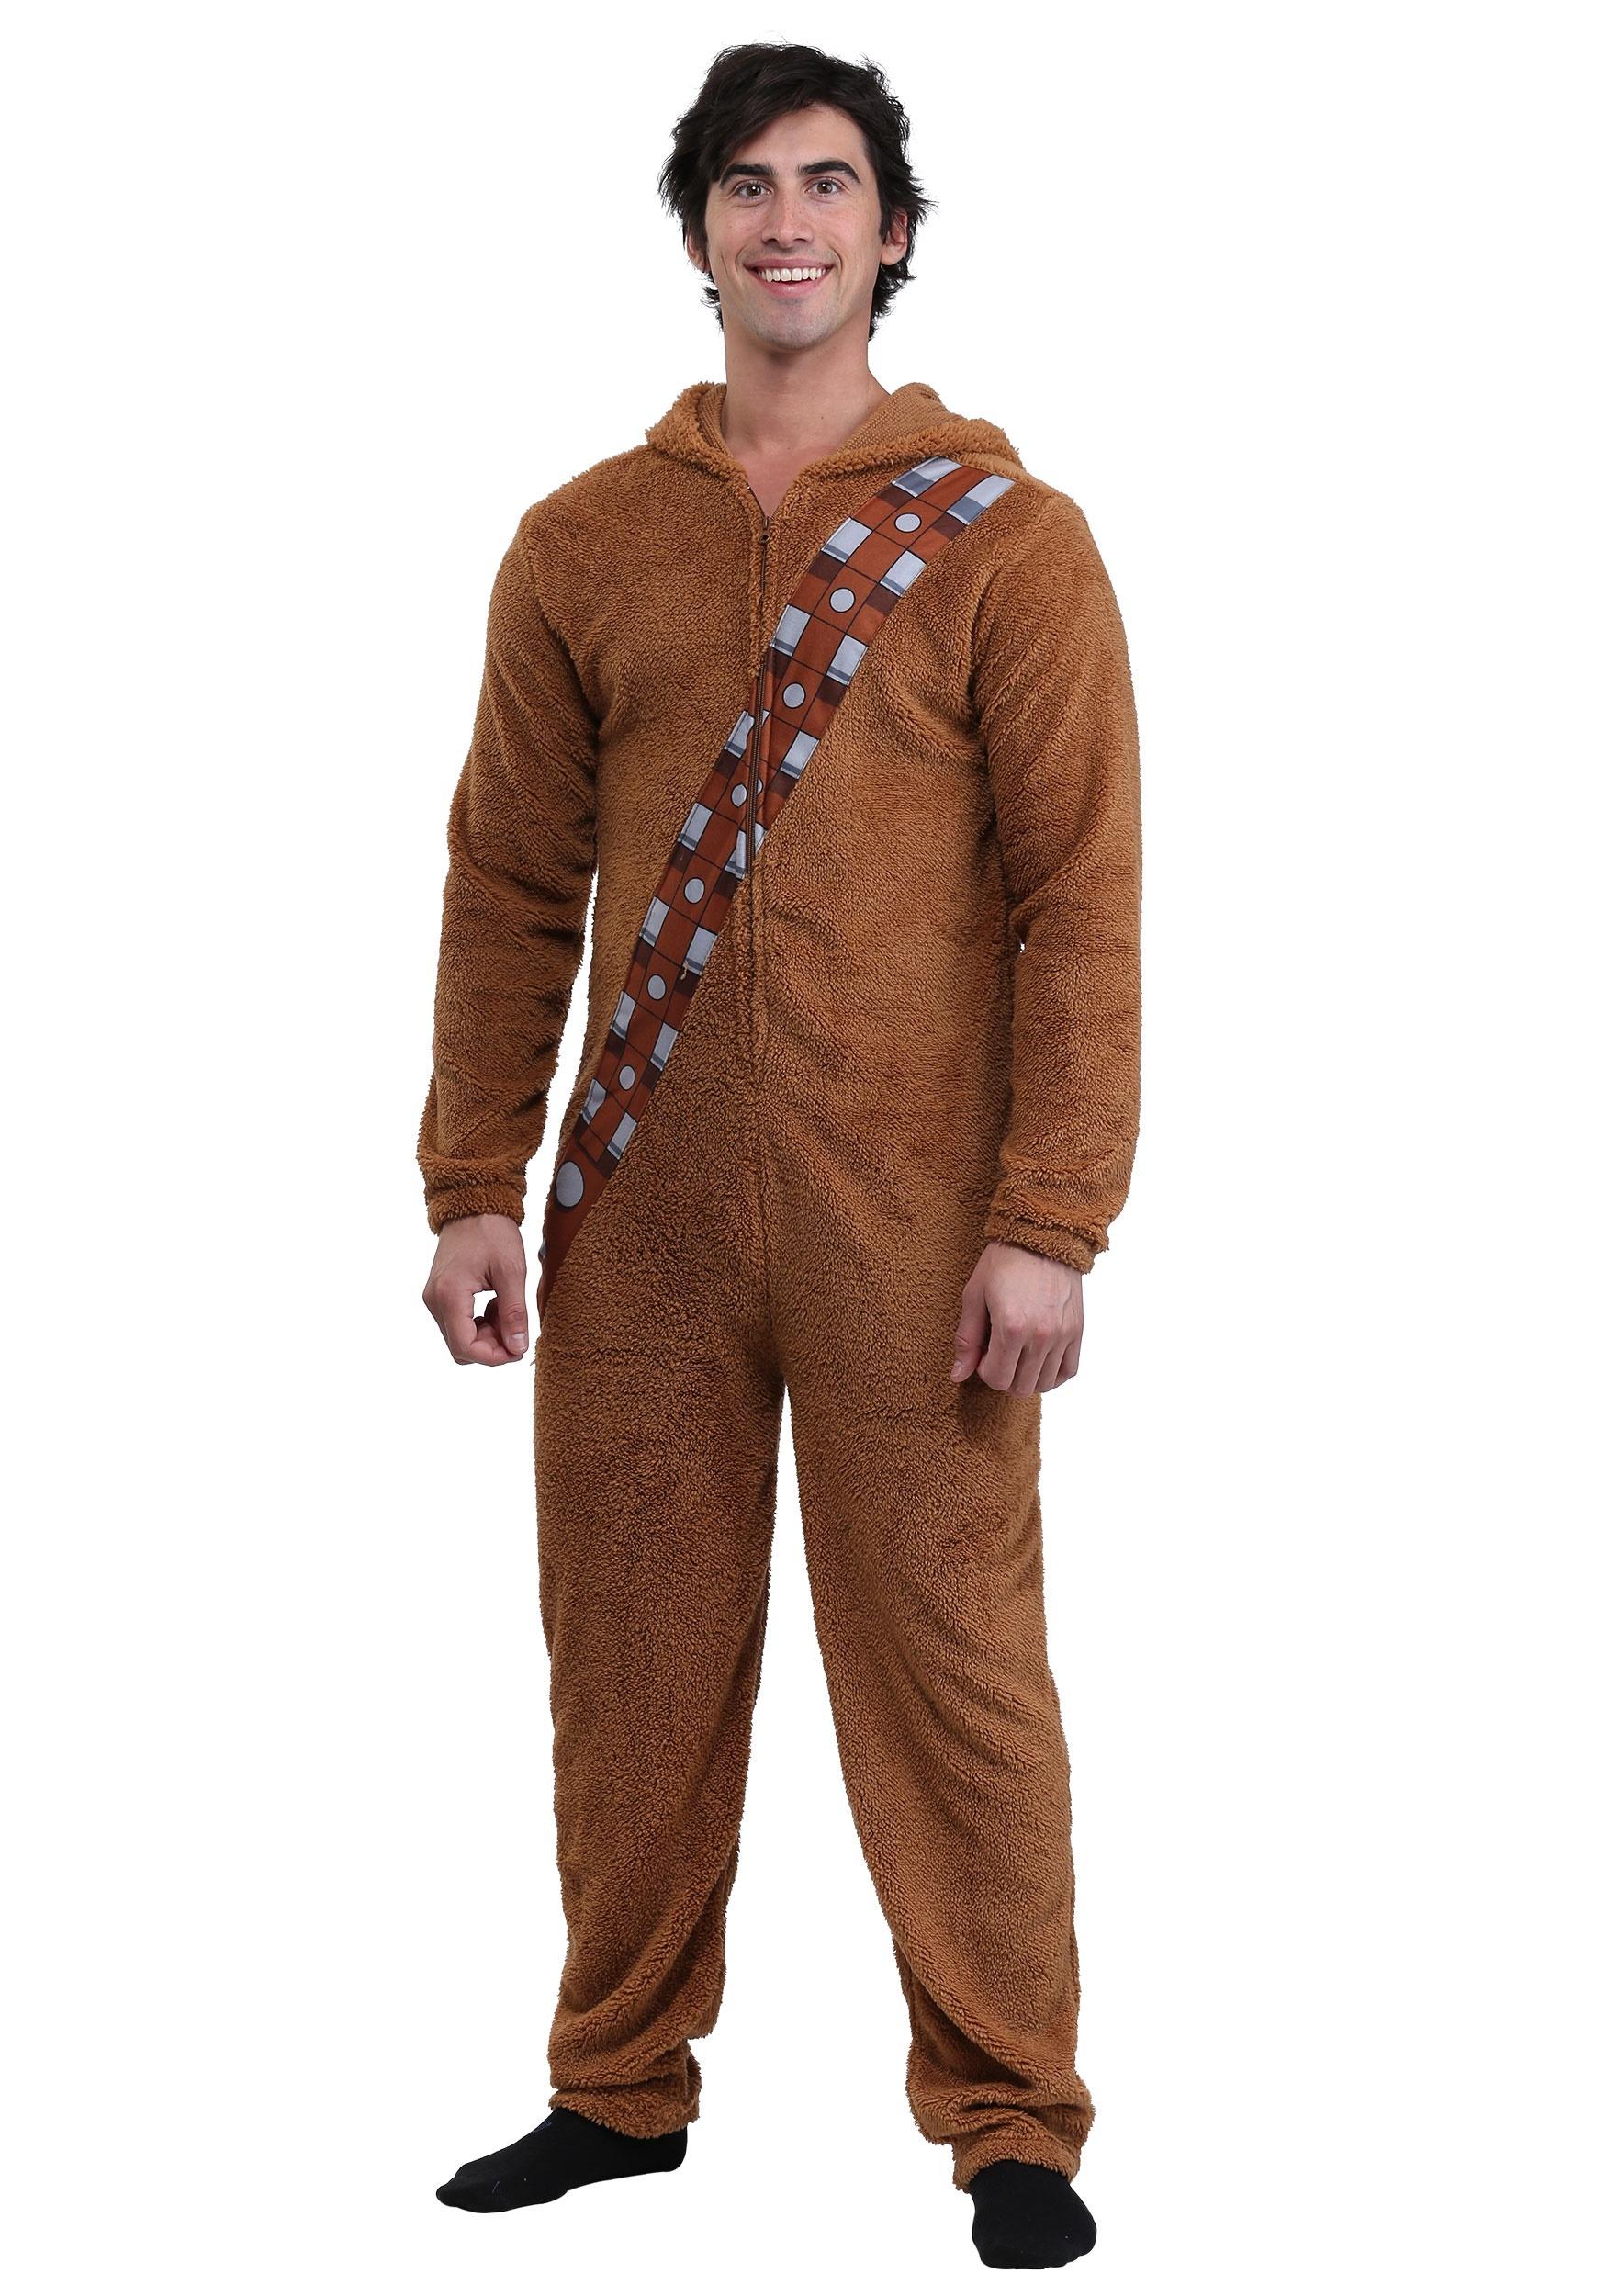 57e8b76ce394 star-wars-chewbacca-adult-onesie.jpg